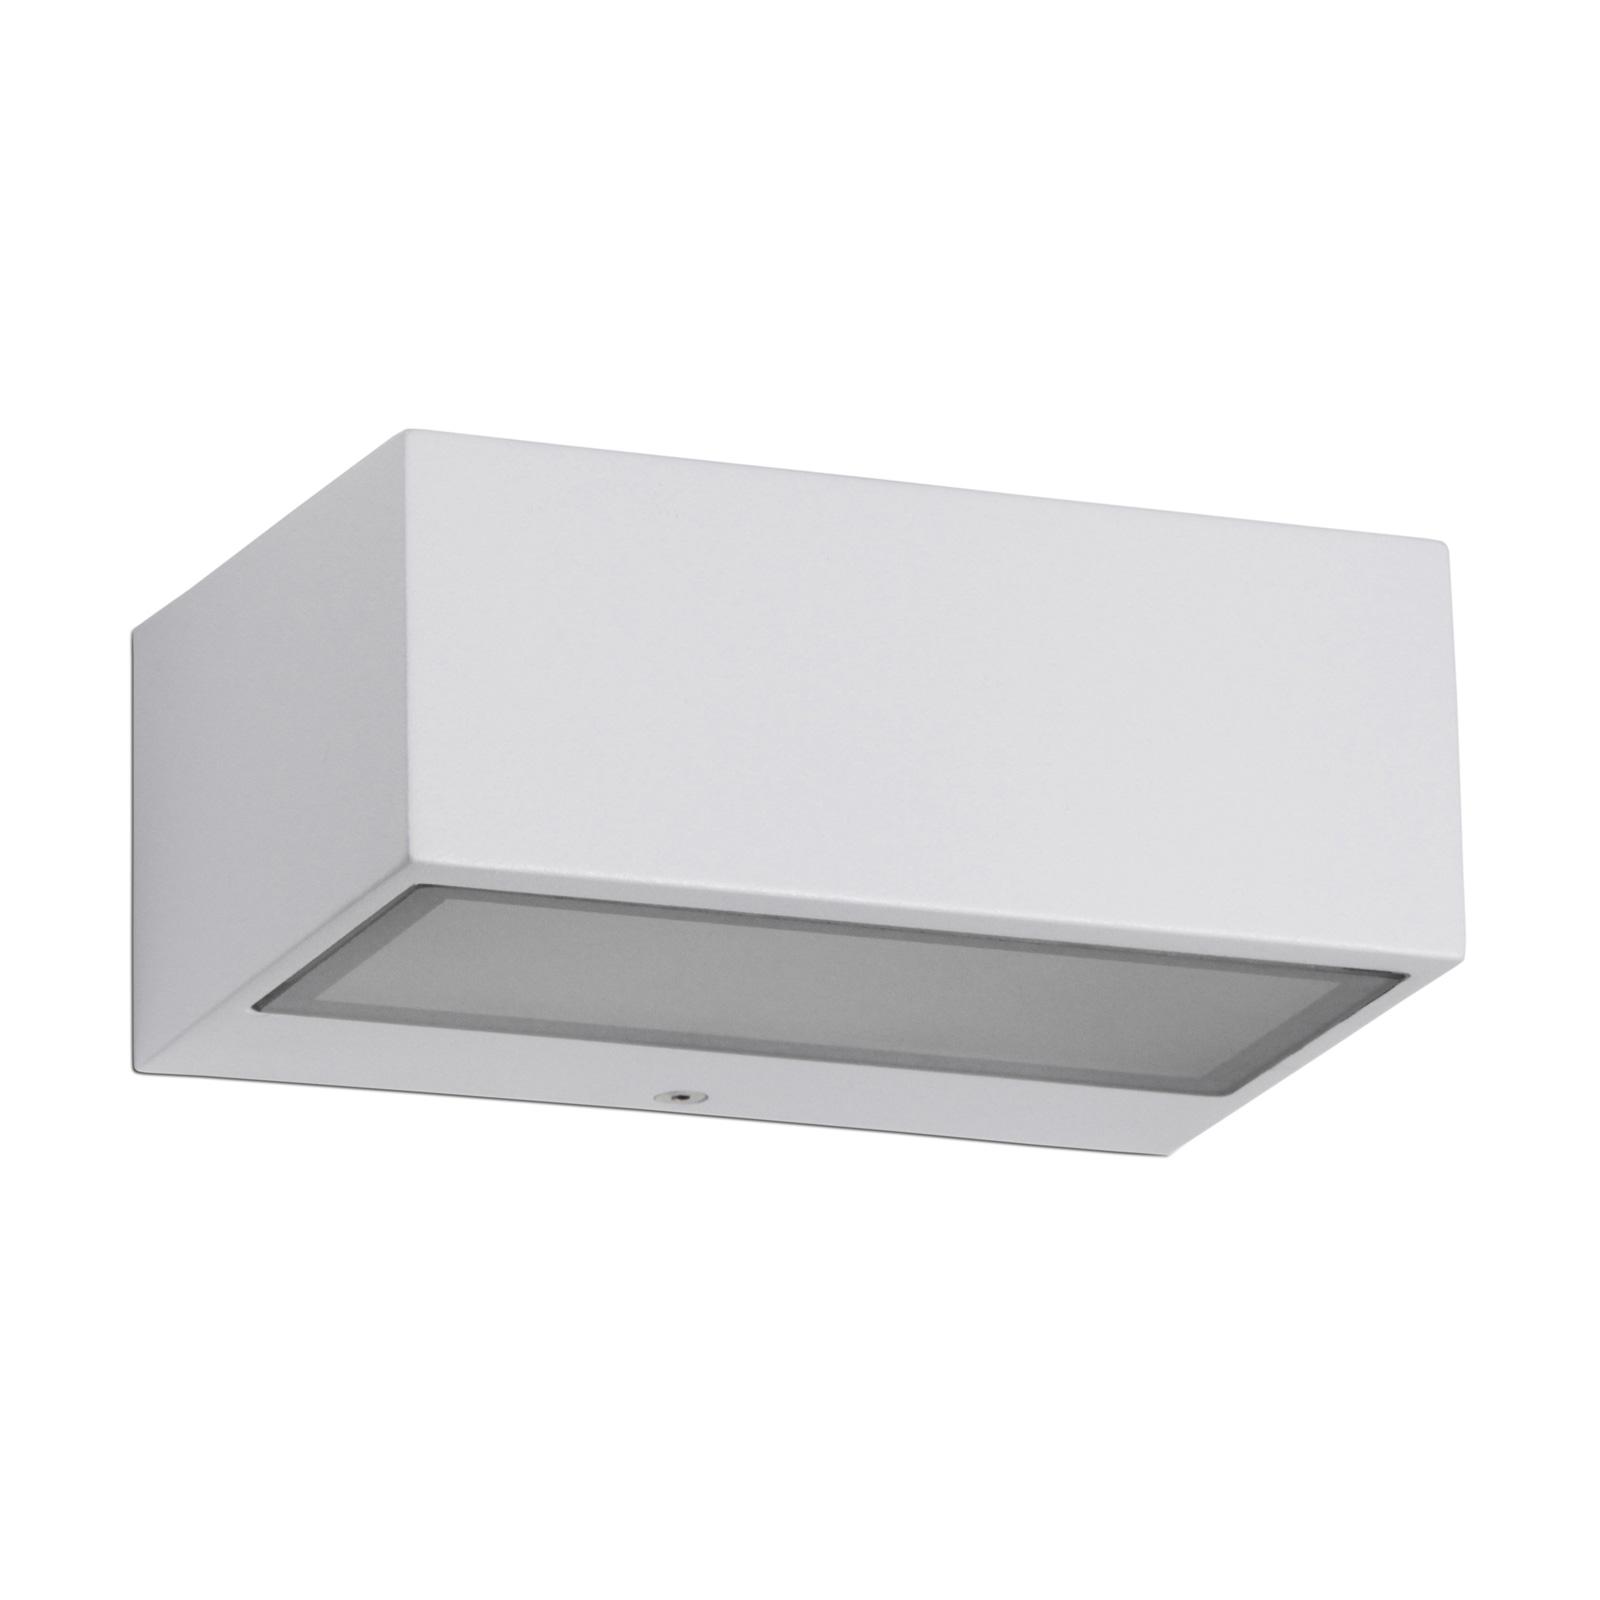 LEDS-C4 Nemesis applique da esterni, bianca